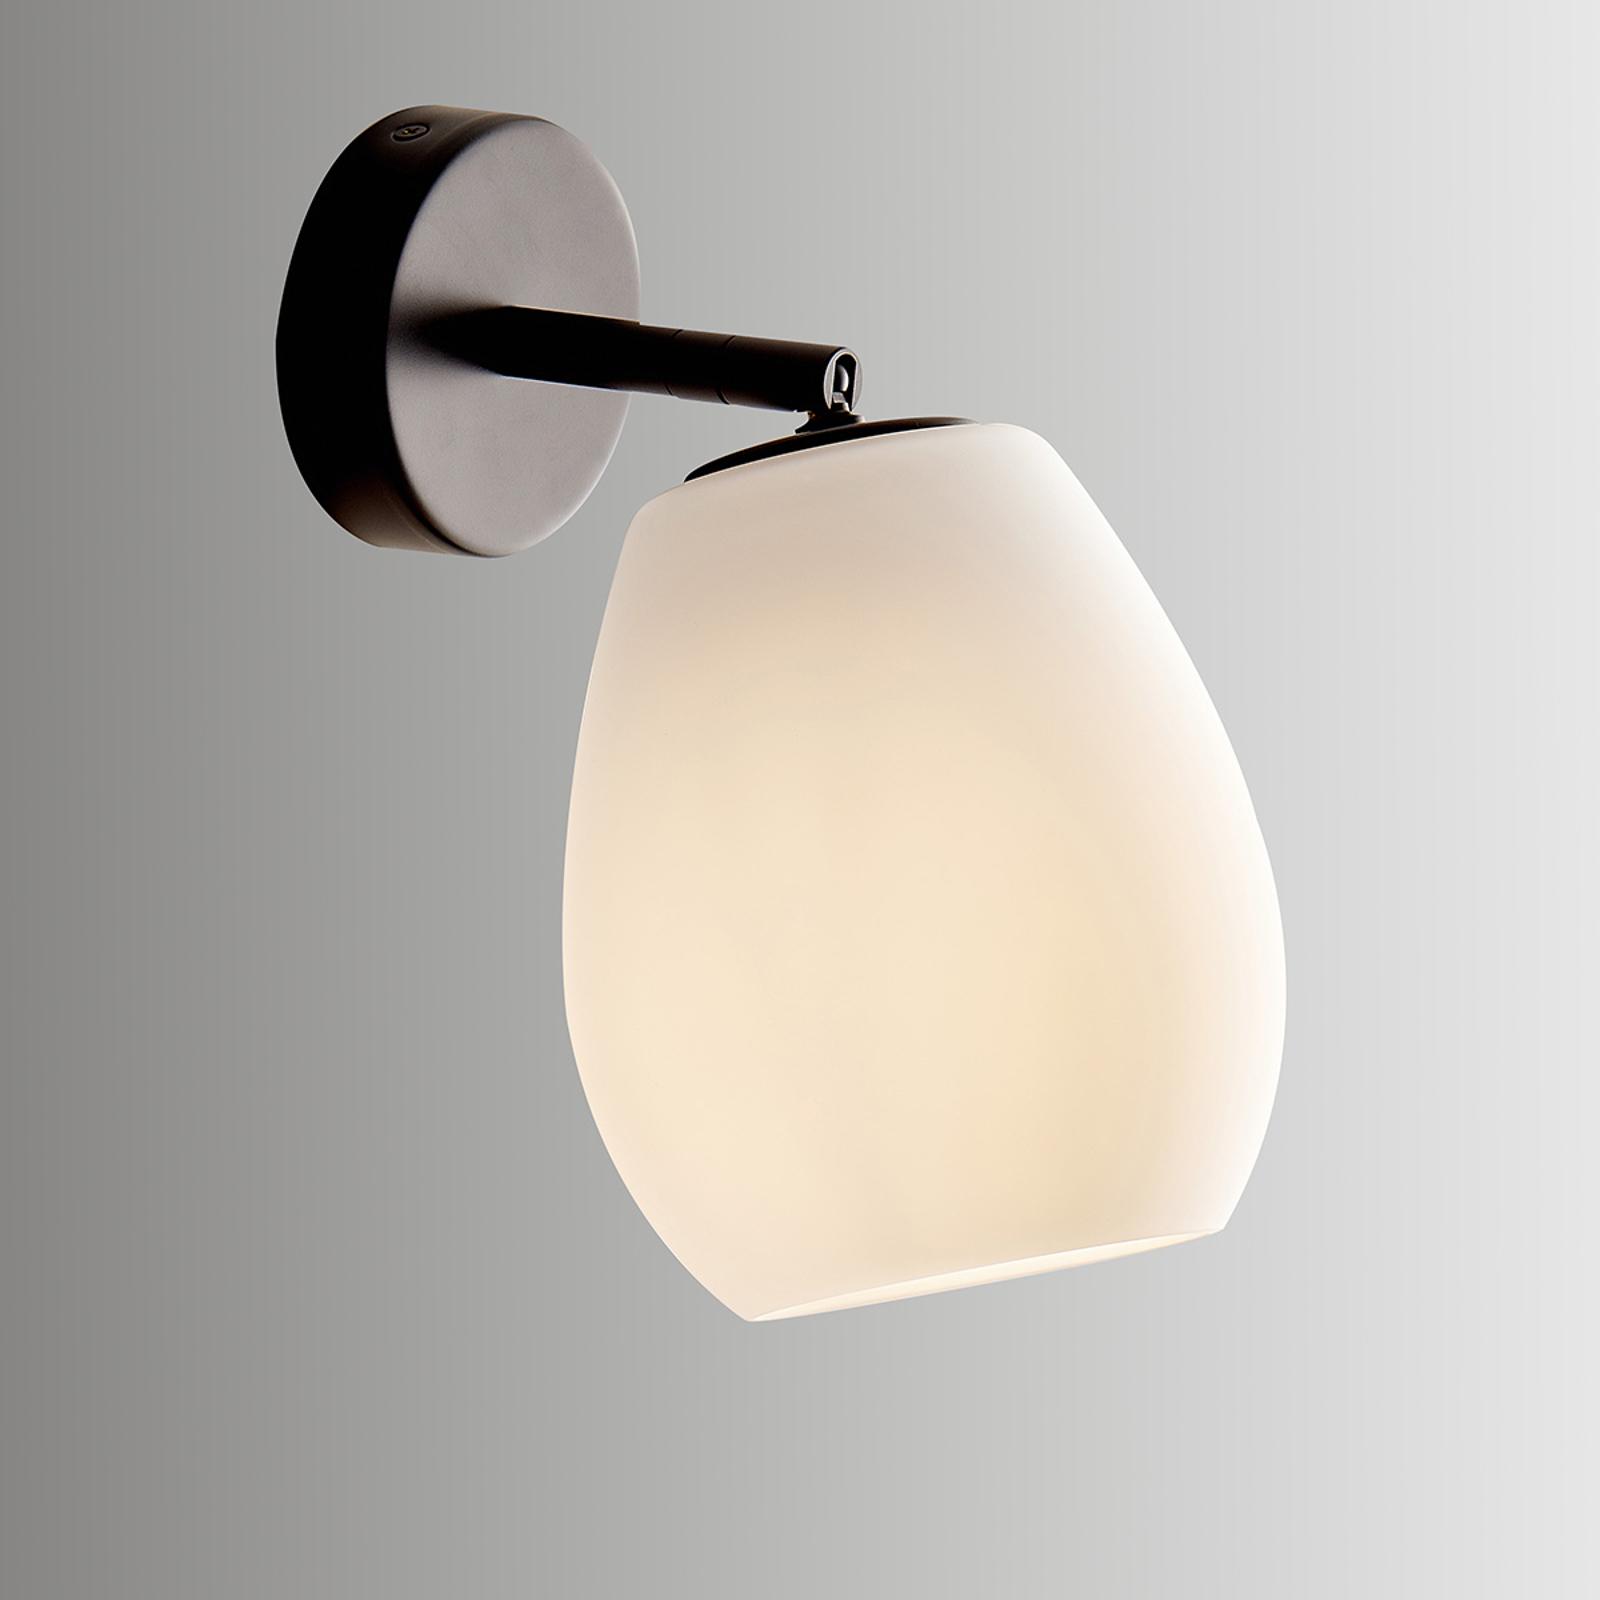 Casablanca Bagan - variabele wandlamp, opaal wit